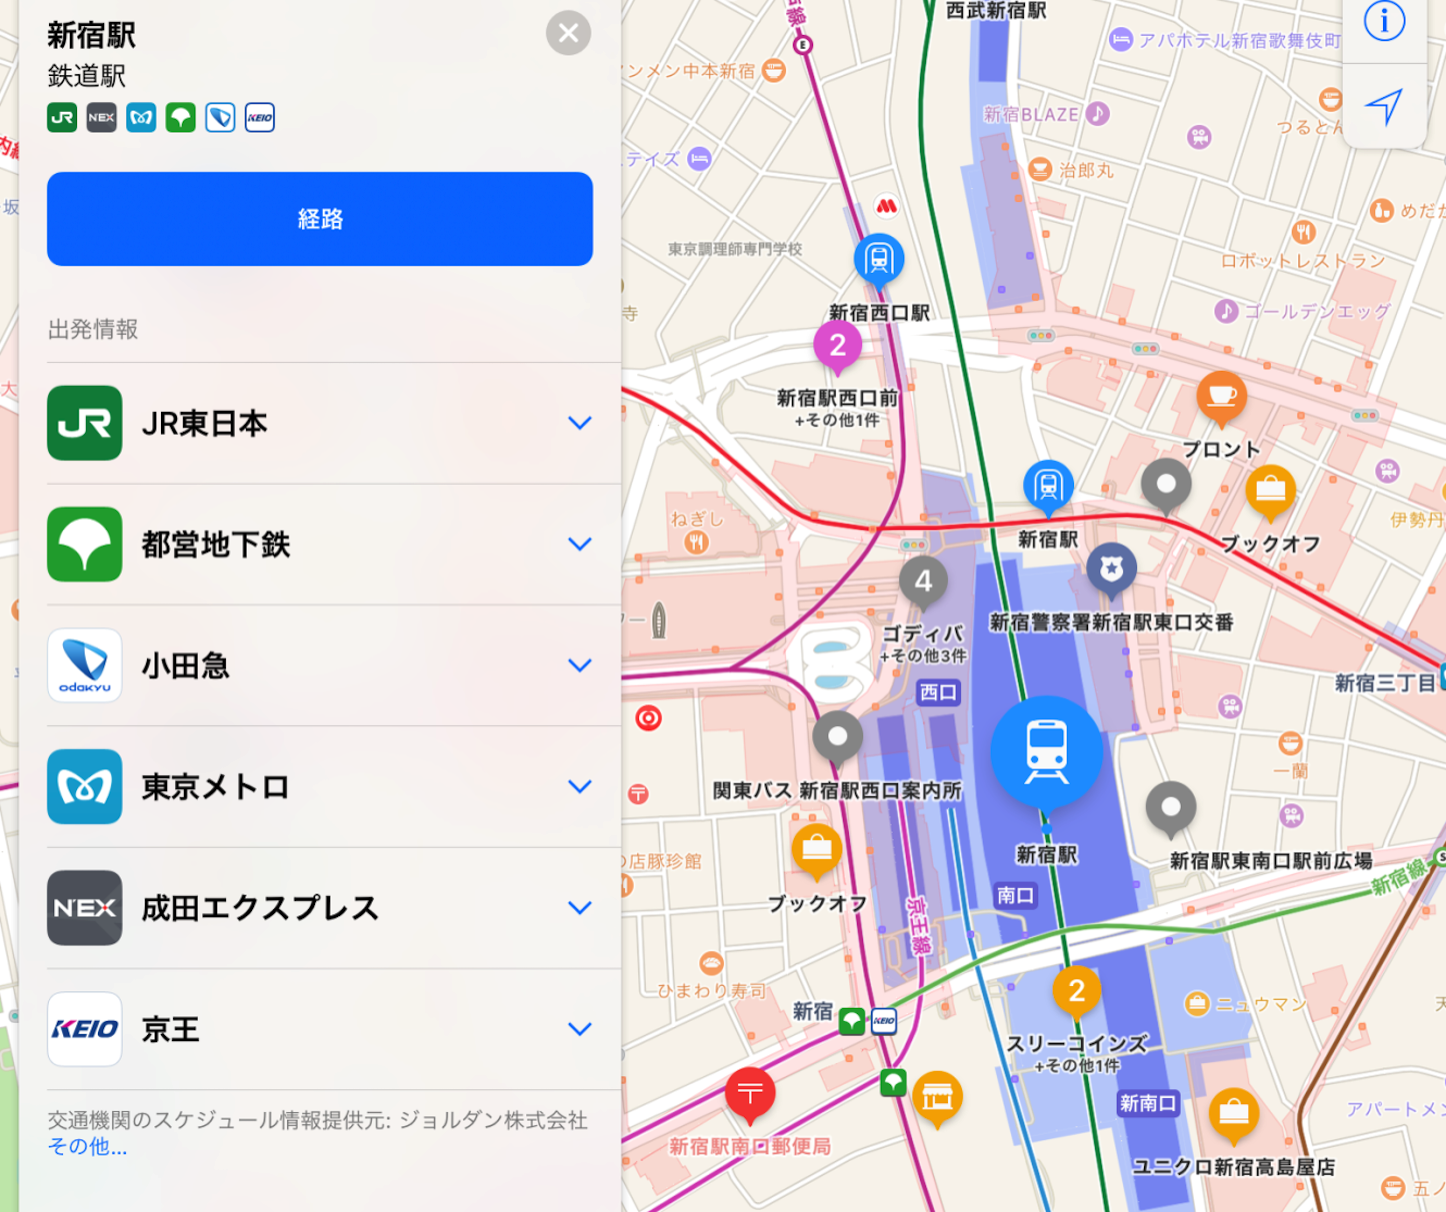 Transit Live In Japan